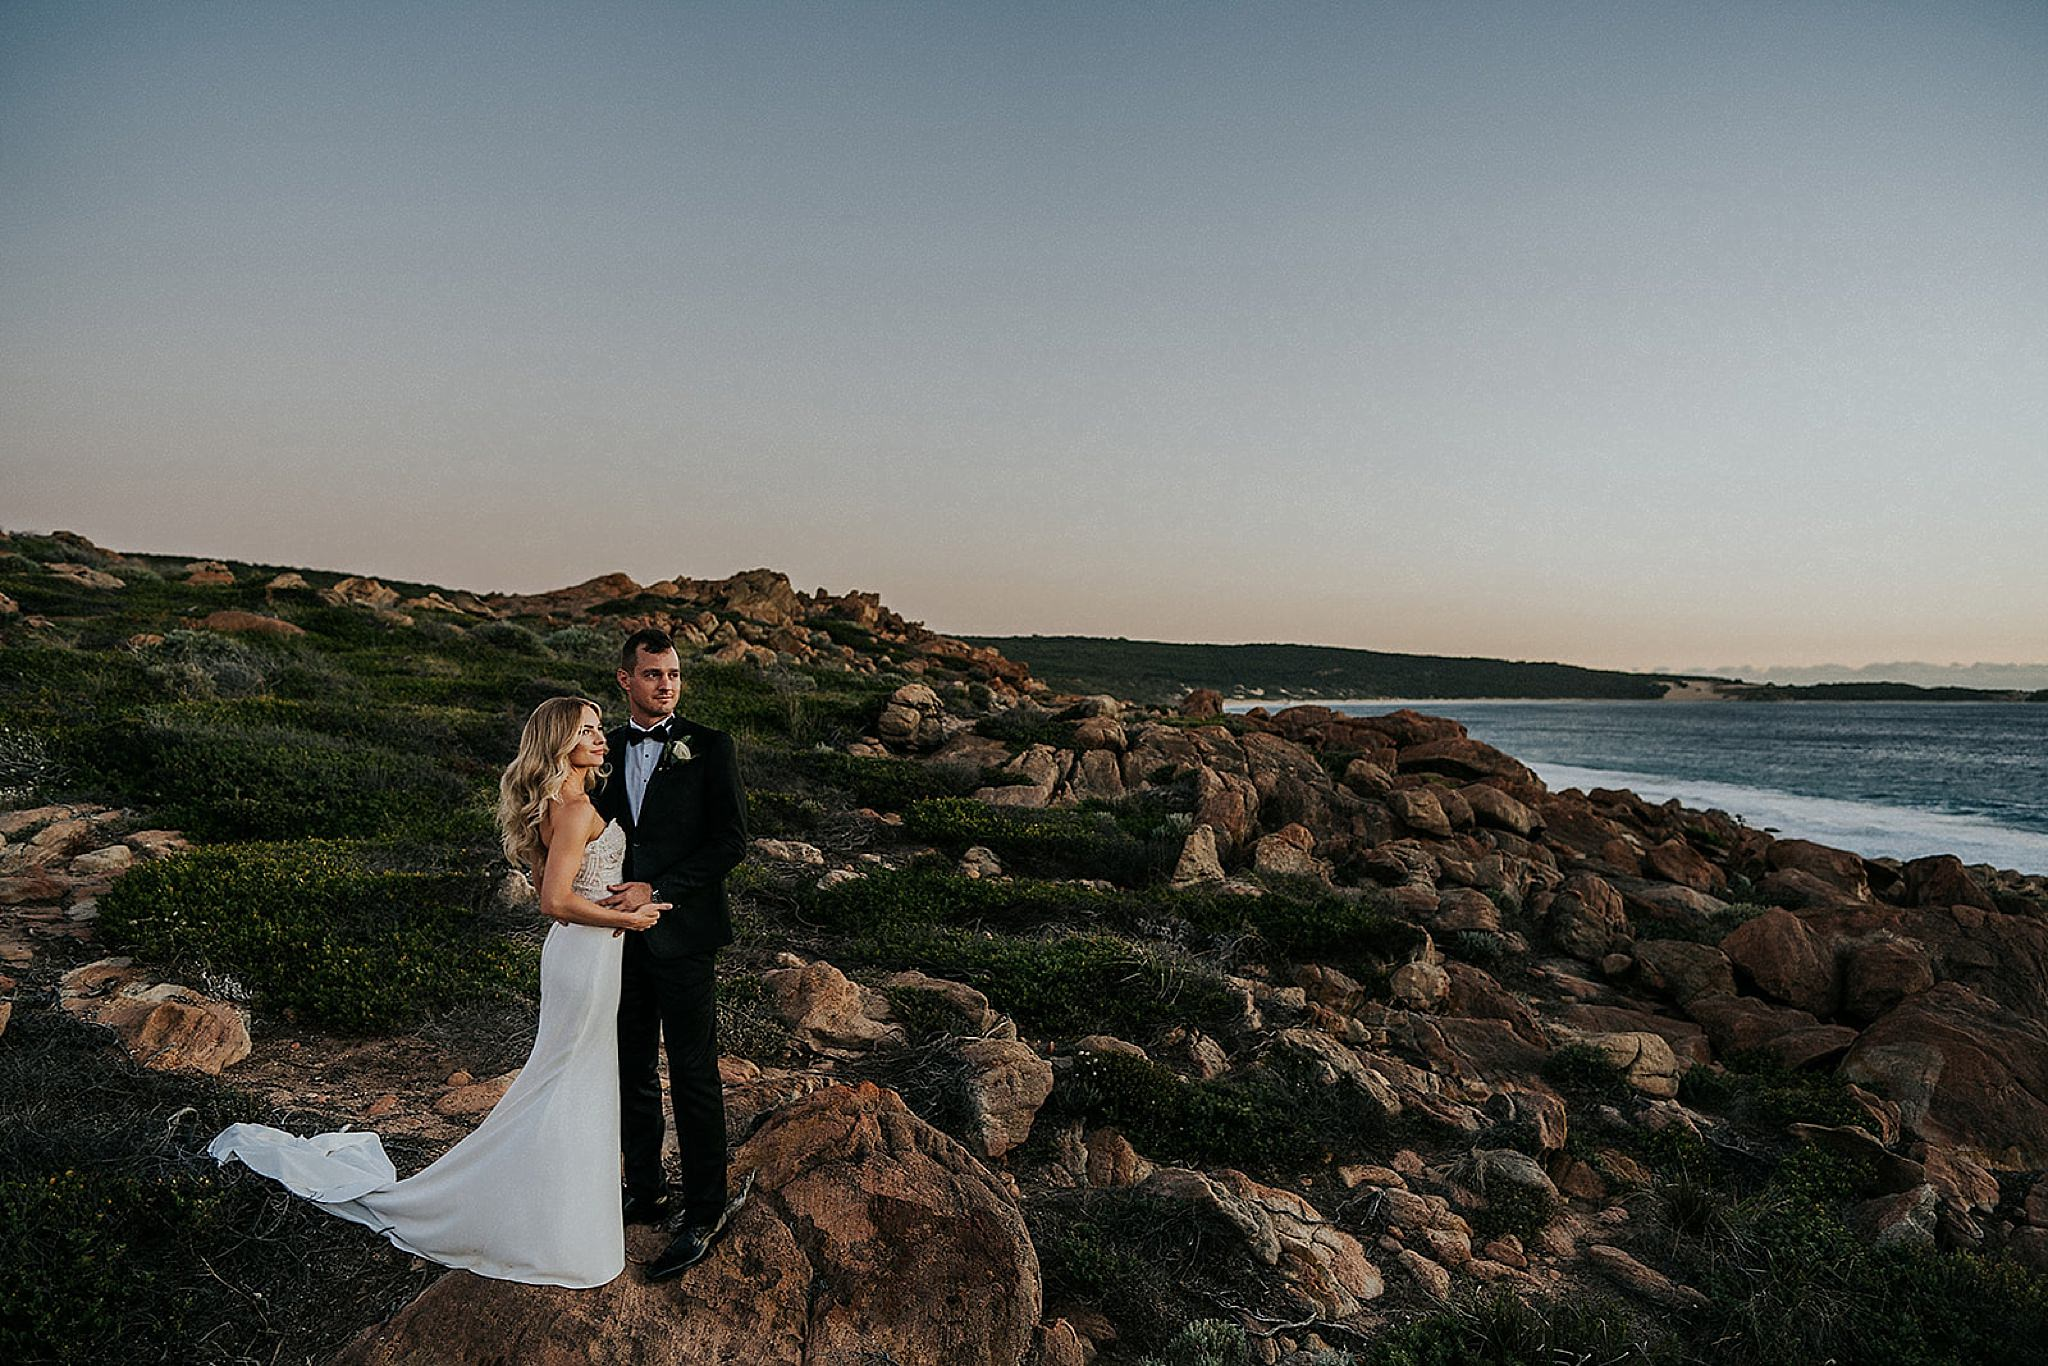 Injidup Spa Wedding photos for Asha and Tristan's Credaro Wines Wedding. Wedding dress by Bridal By Aubrey Rose, Veil Harriette Gordon bouquet De La Terre and Leave Her Wilder Bridesmaids.